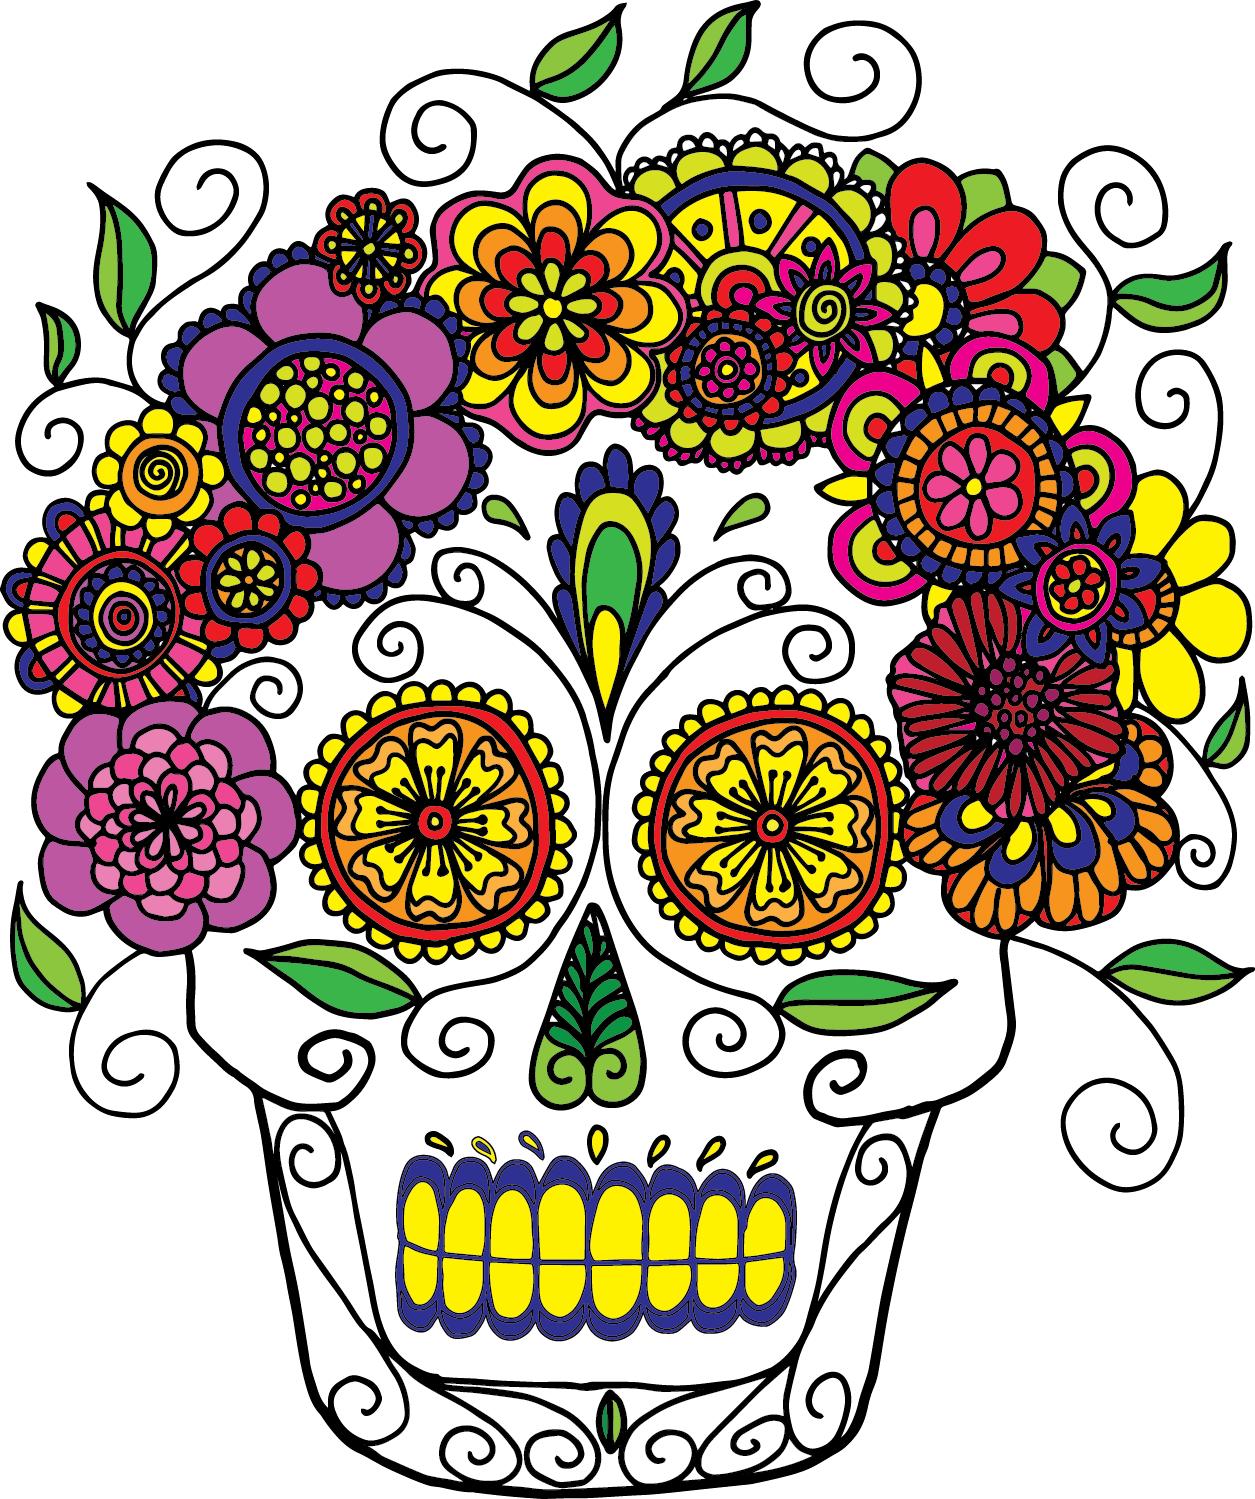 Adult Coloring Pages - Sugar Skulls | mexican folk art | Pinterest ...